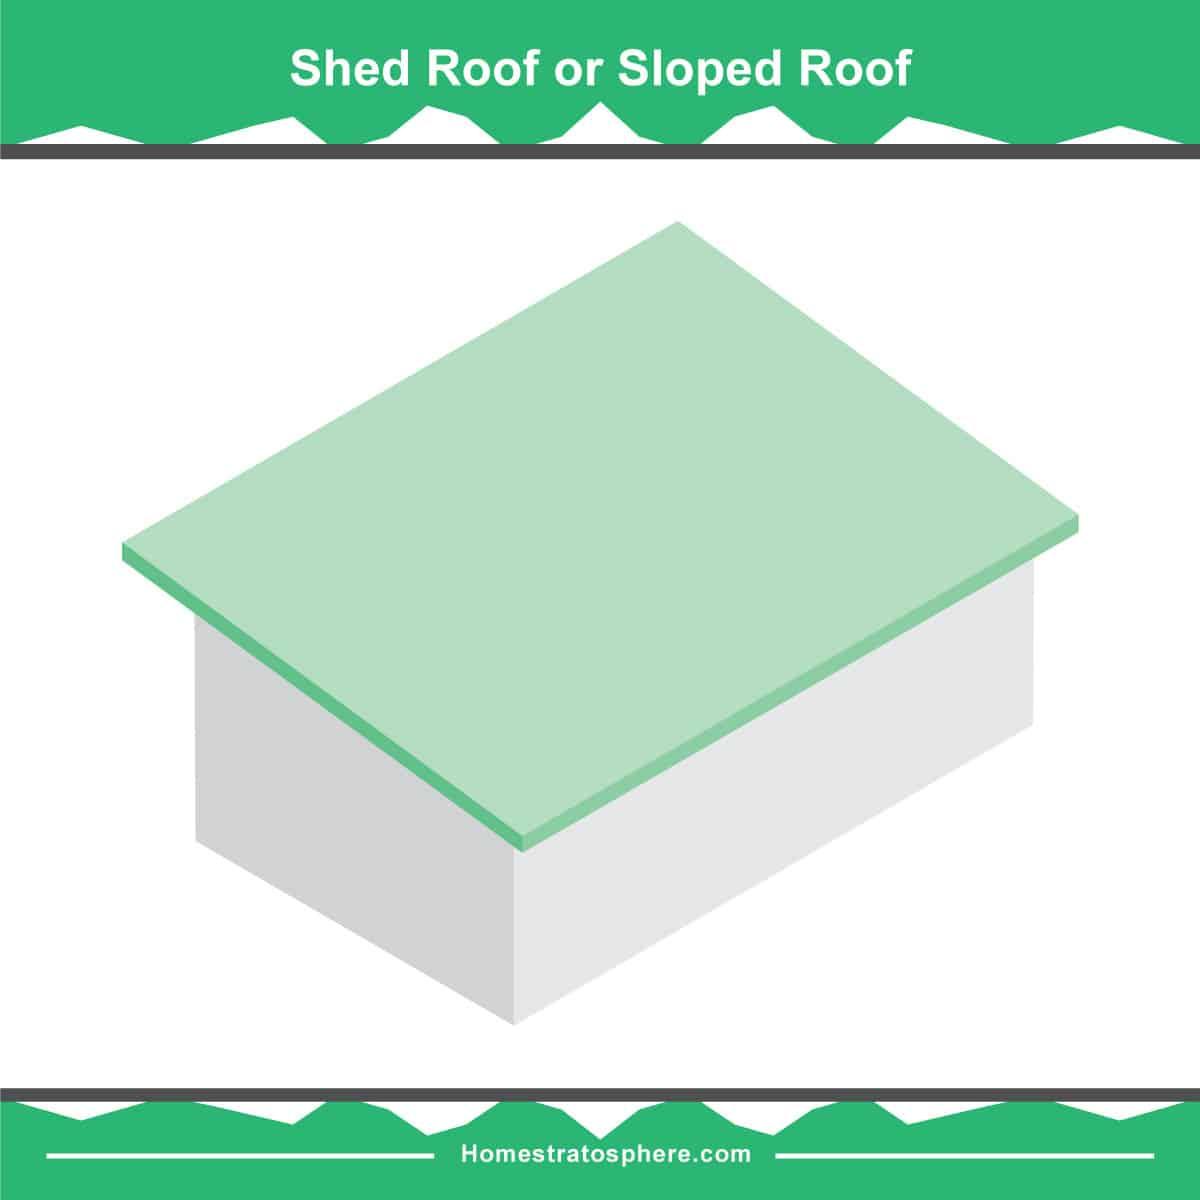 Shed or sloped roof diagram